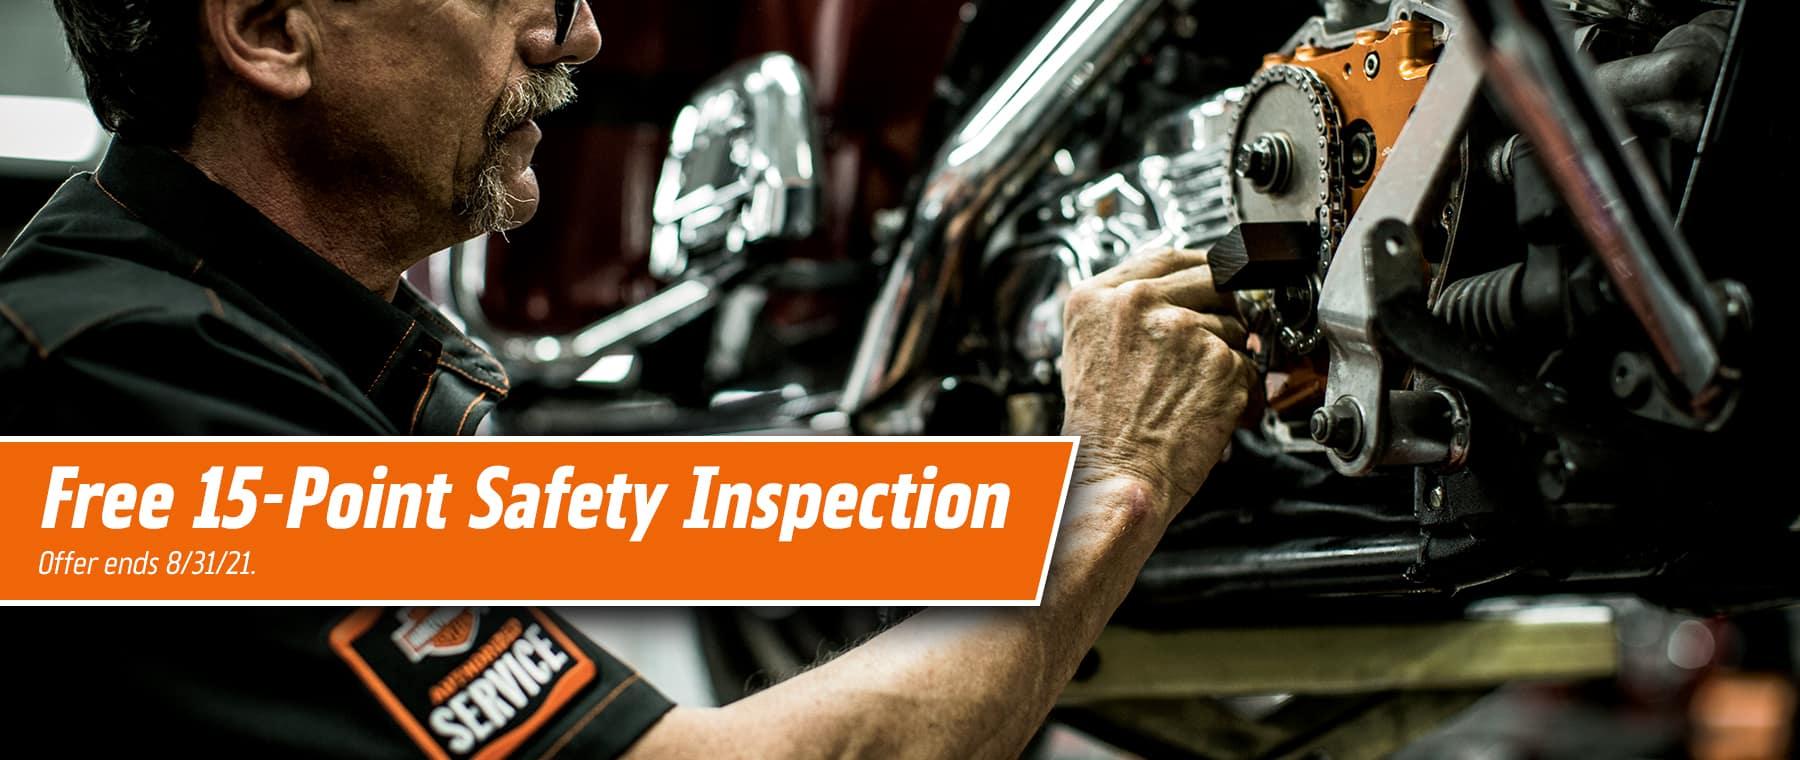 LKHD088216-01-JUL21-Aug-Sales-Sliders_safety